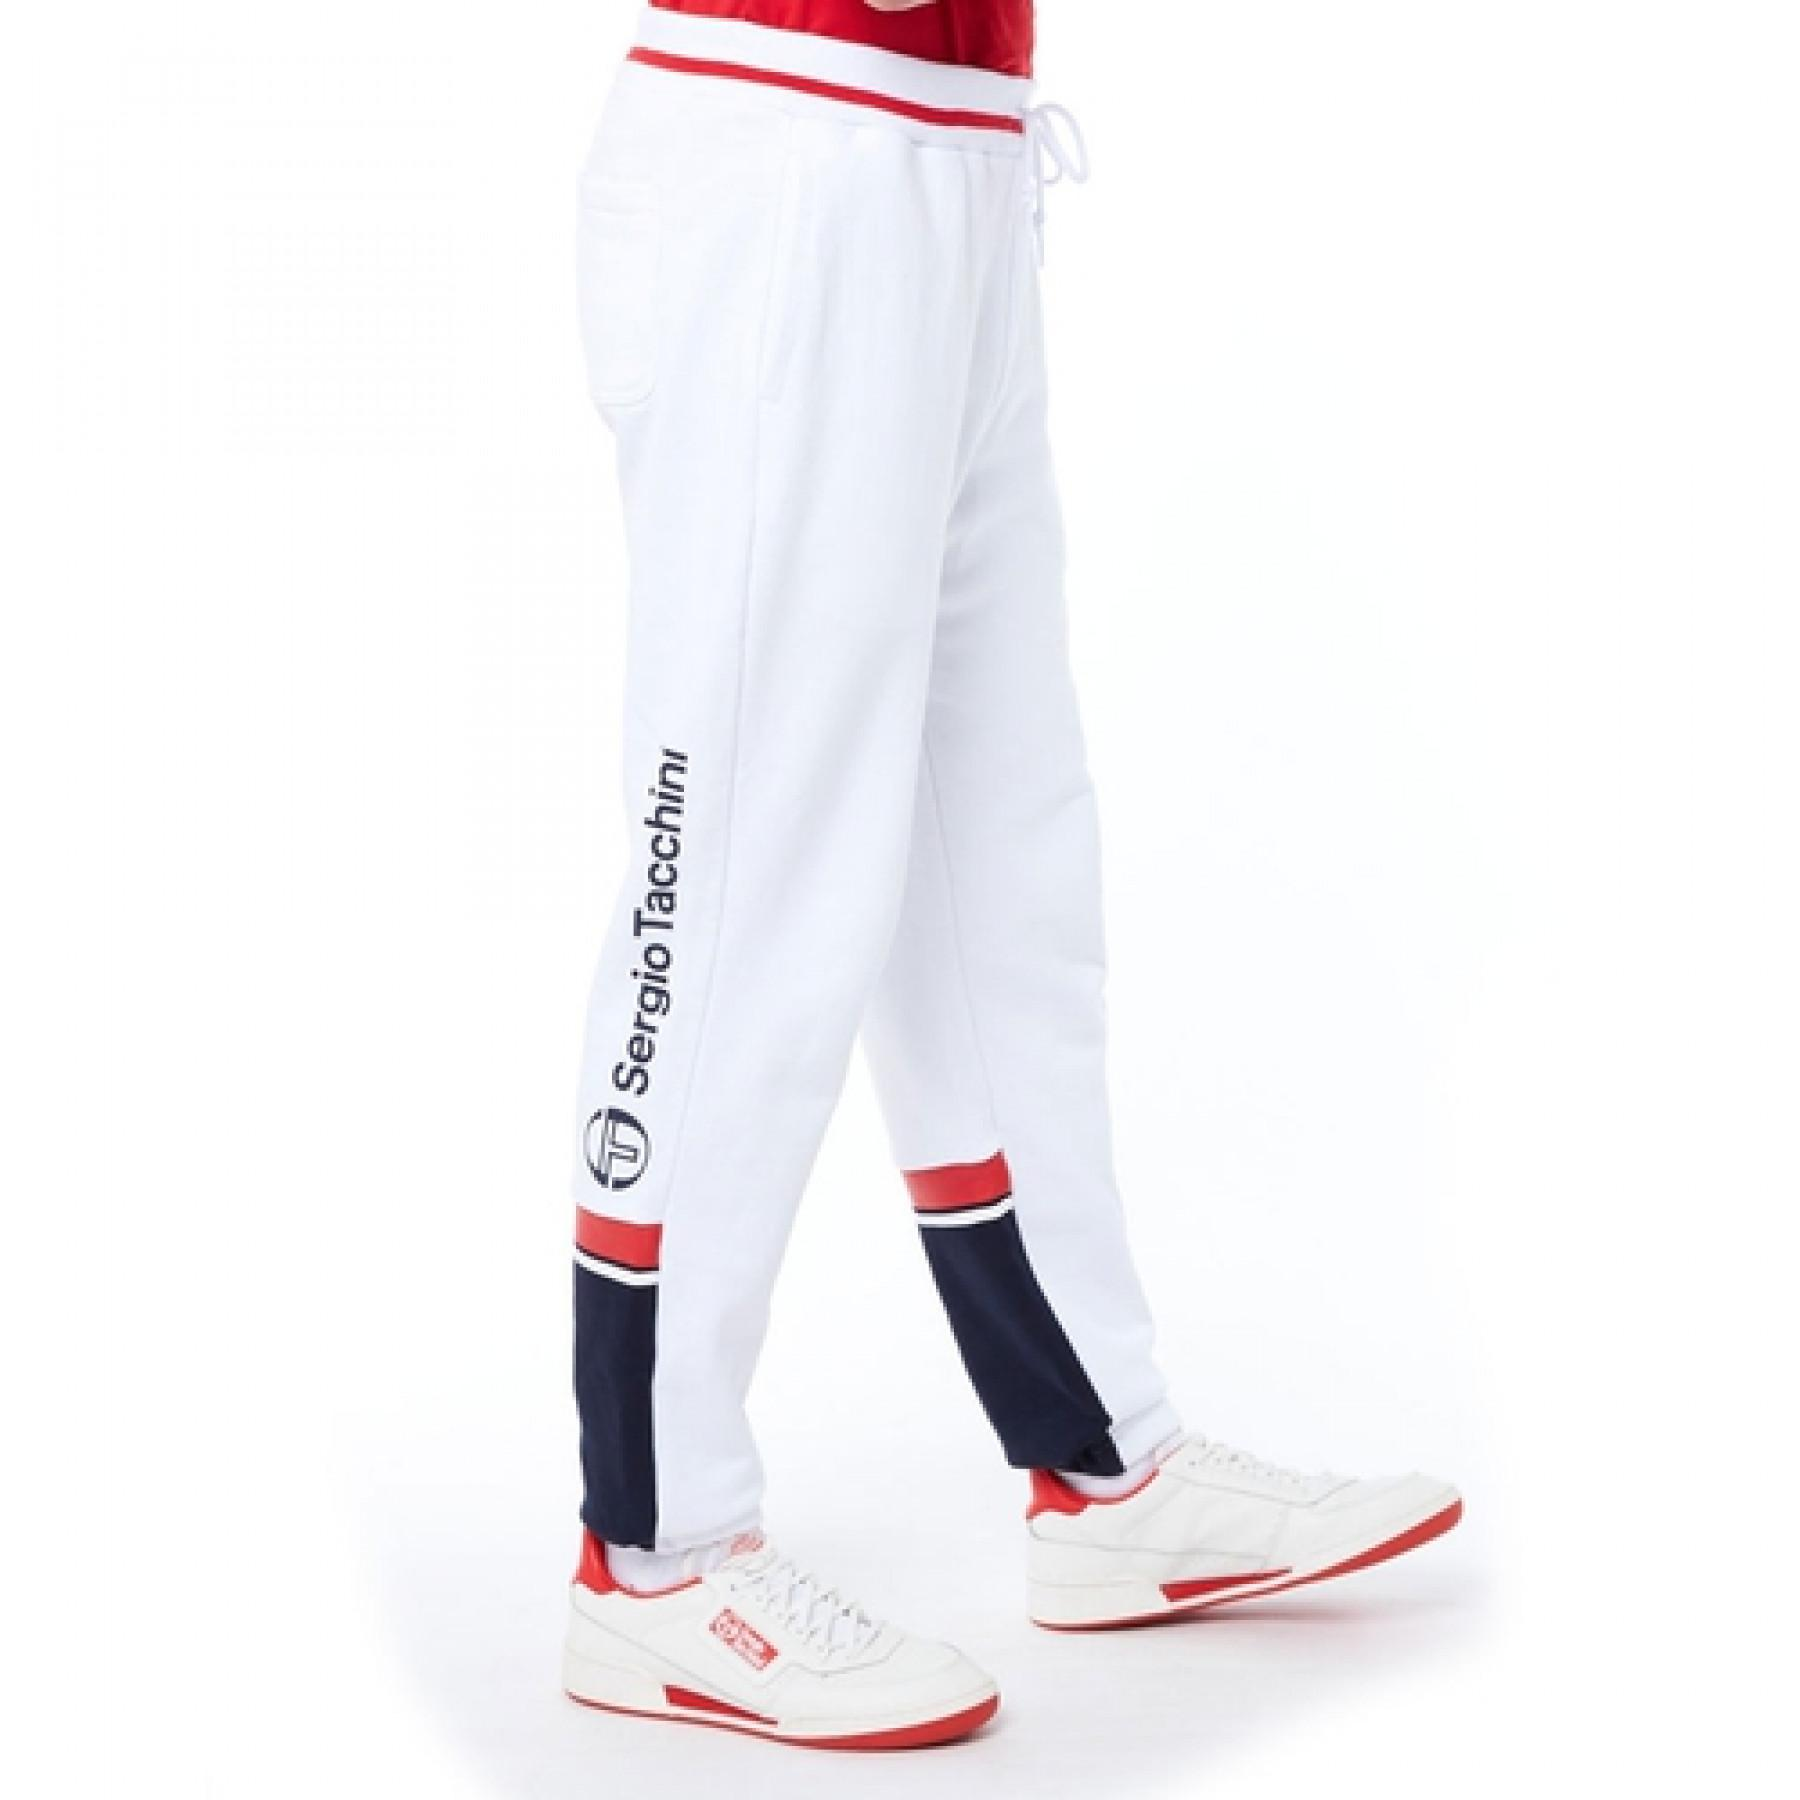 Sergio Tacchini Almond Jogging Pants